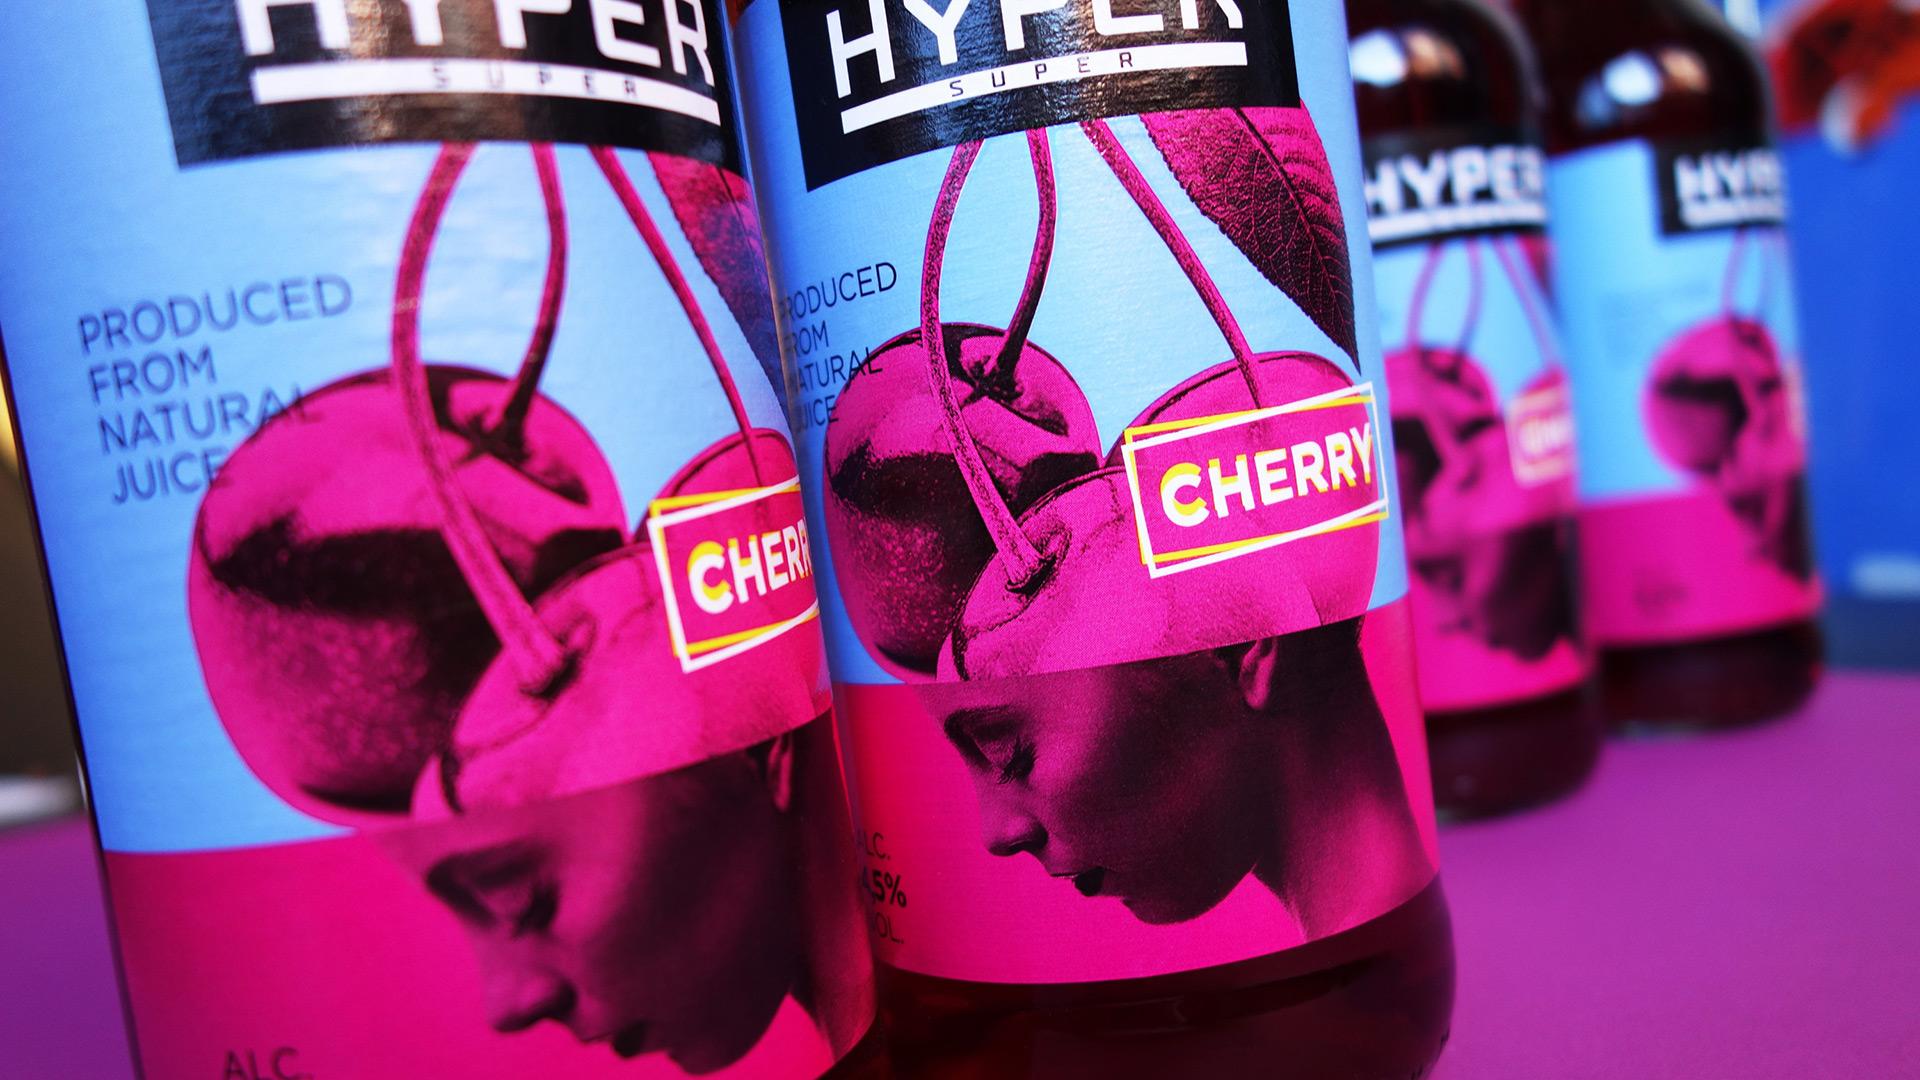 Branding, homofructus, packaging, illustration, packaging design, head, cherry, Hyper, Asgard